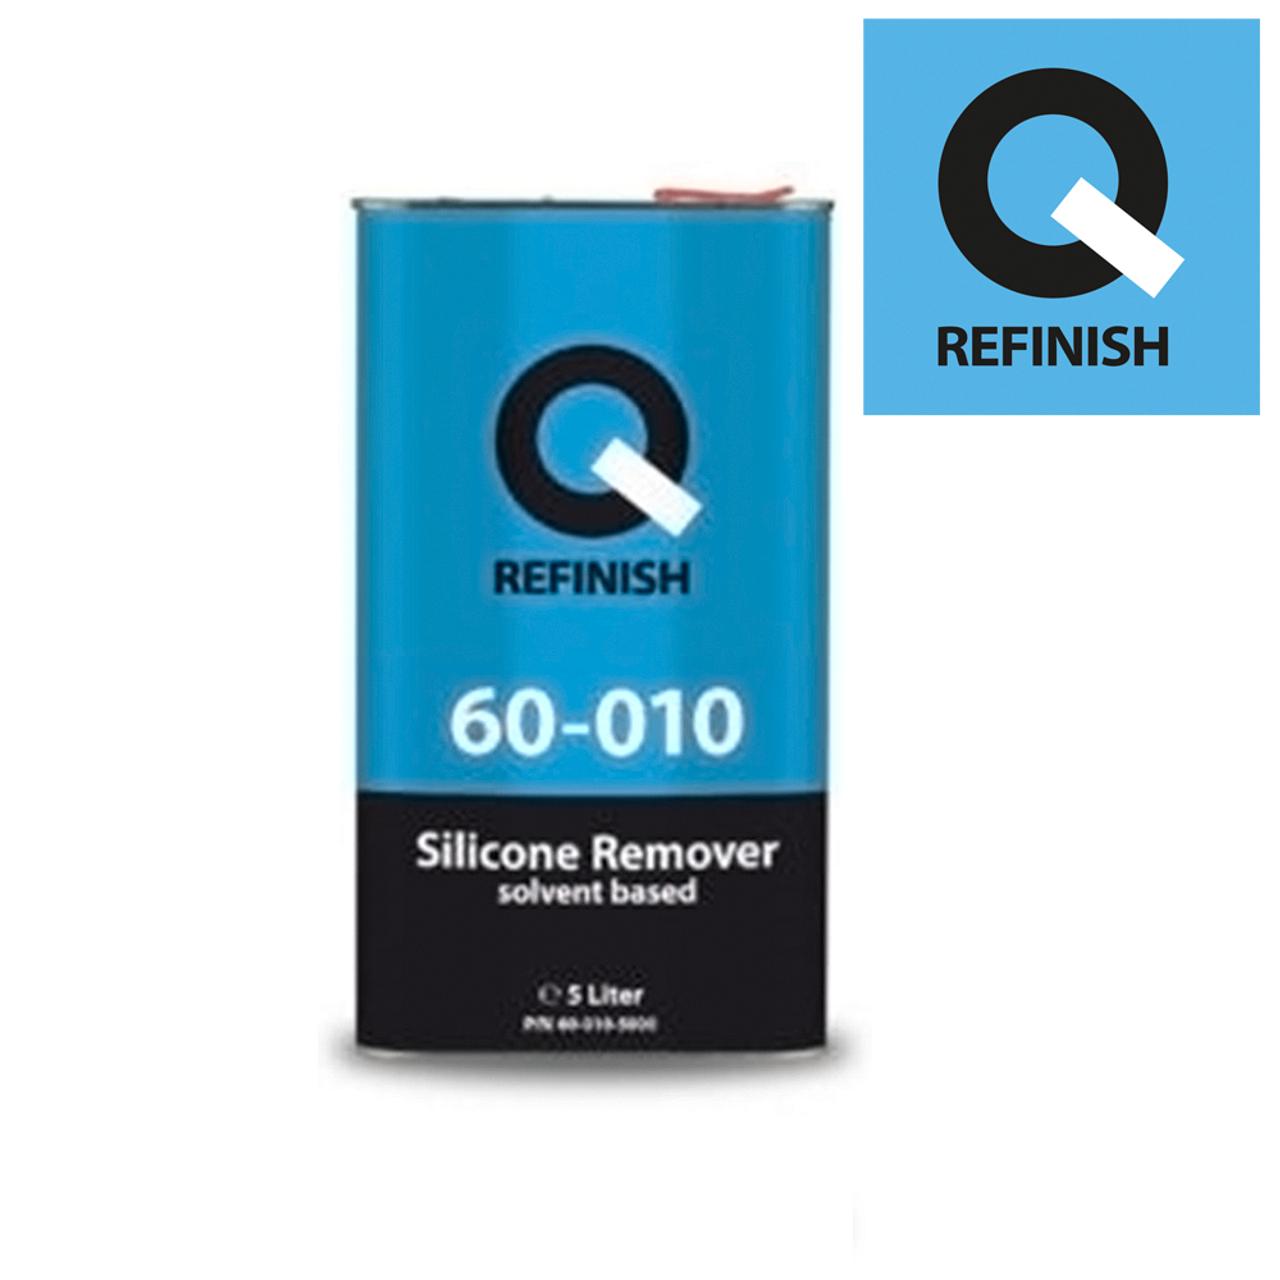 Q Refinish Silicone Remover Solvent Based 5L